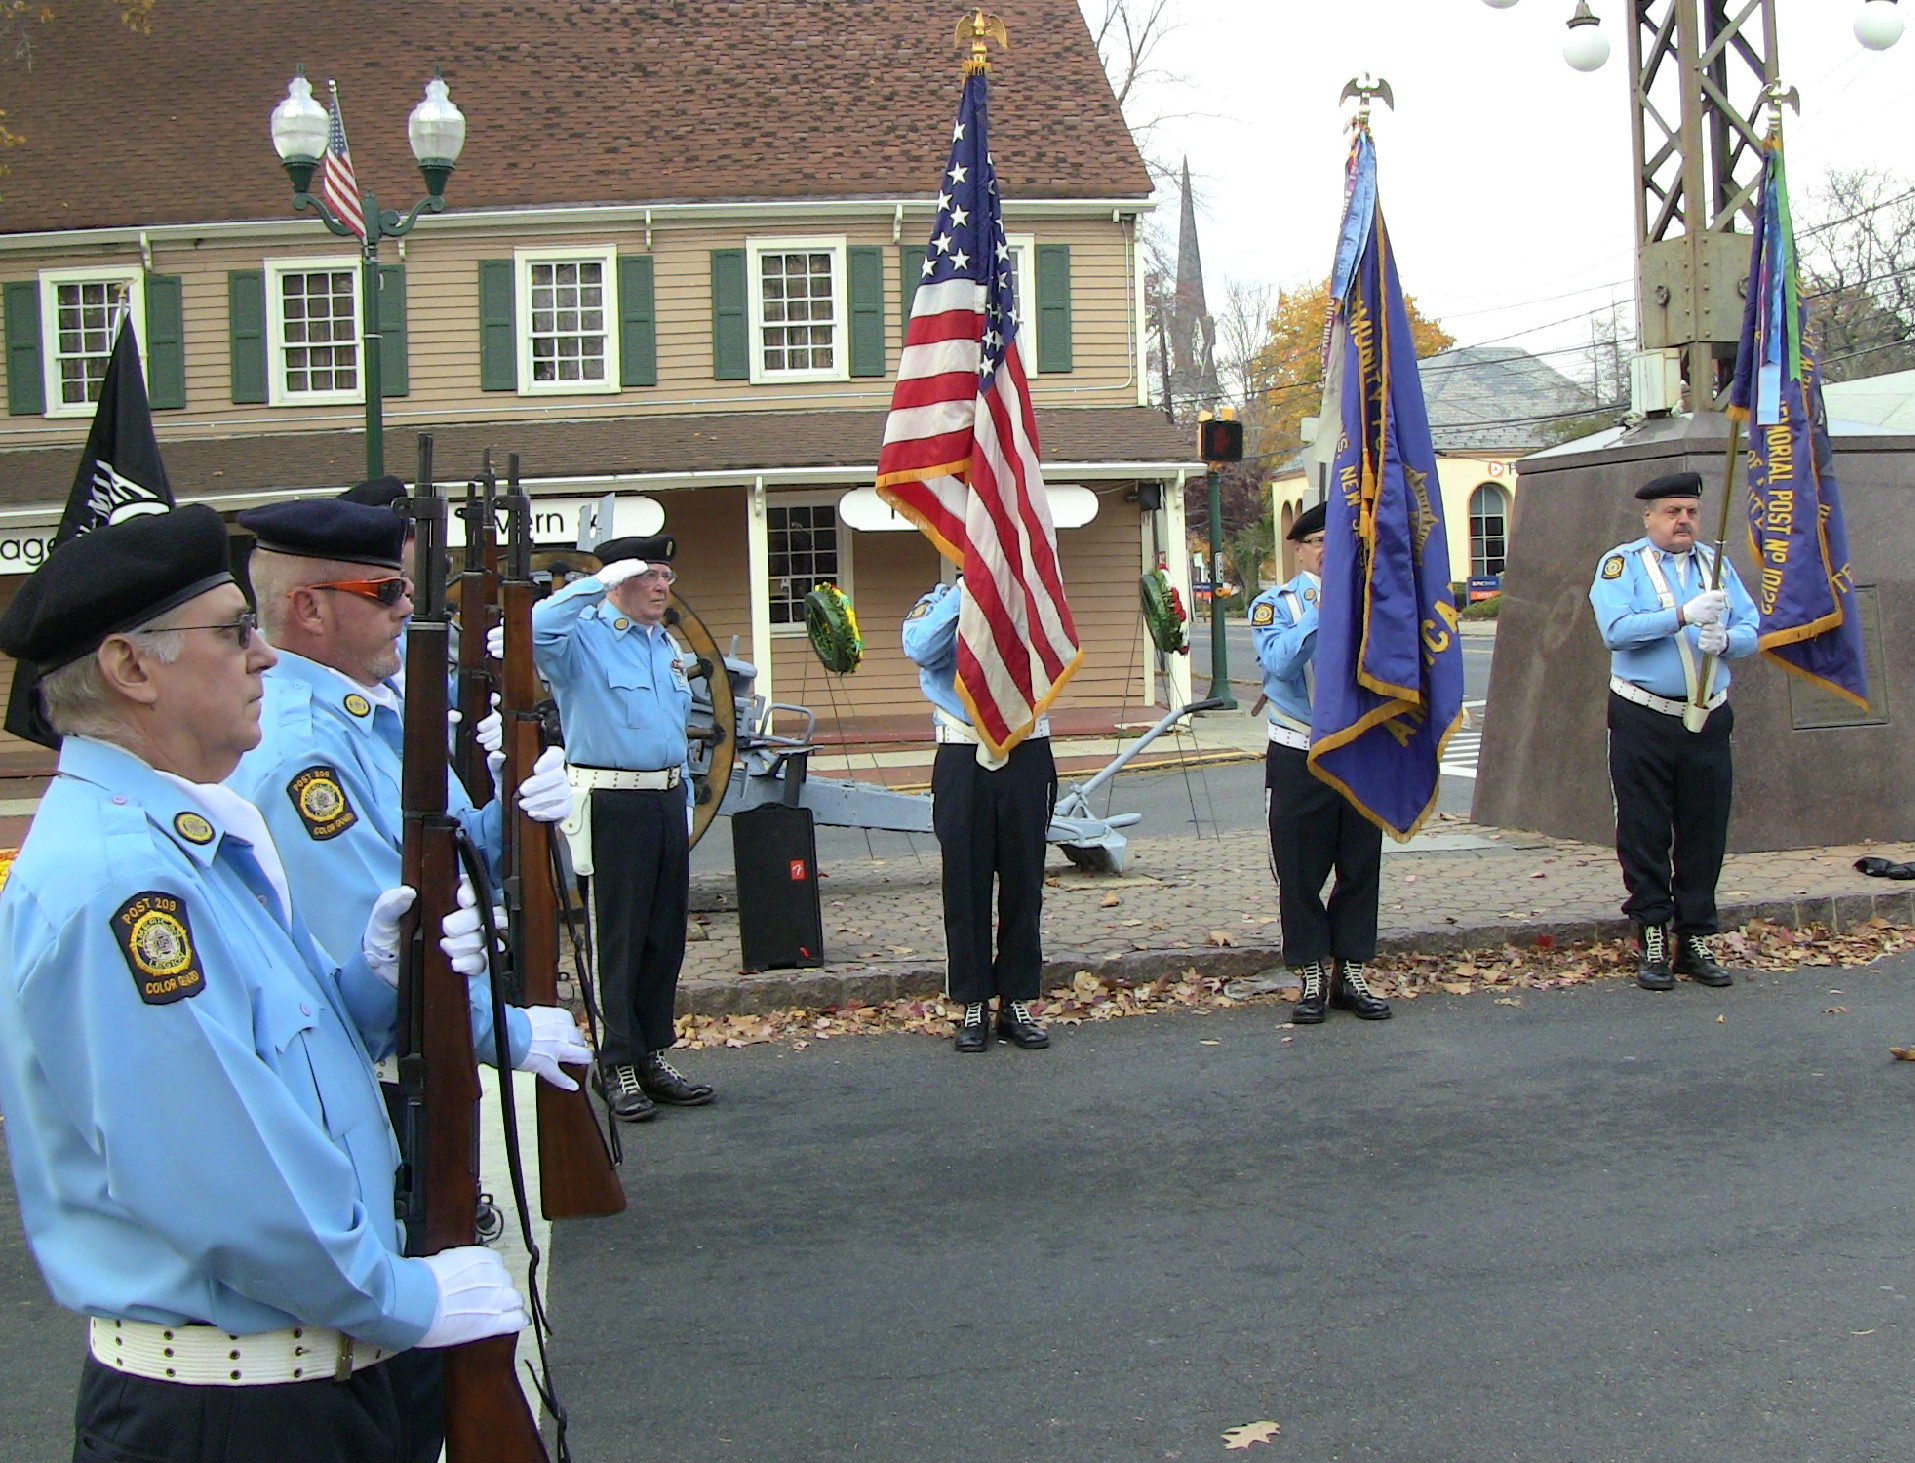 fd1c42505b544a2ab9c3_SP_Veterans_Day_11-11-14.JPG